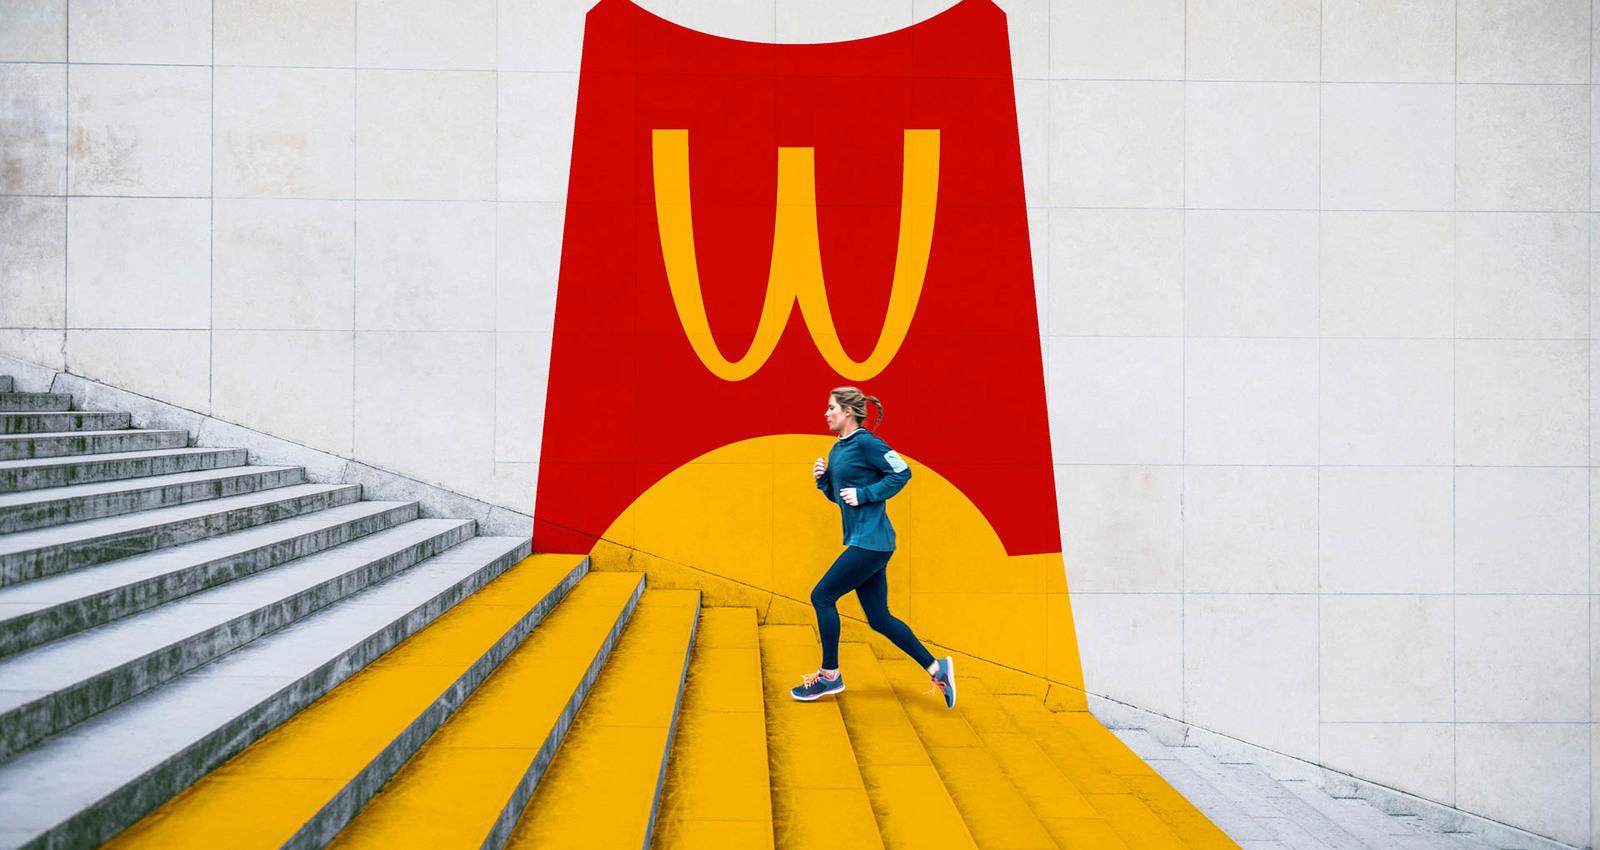 McDonald's - Visual Identity System